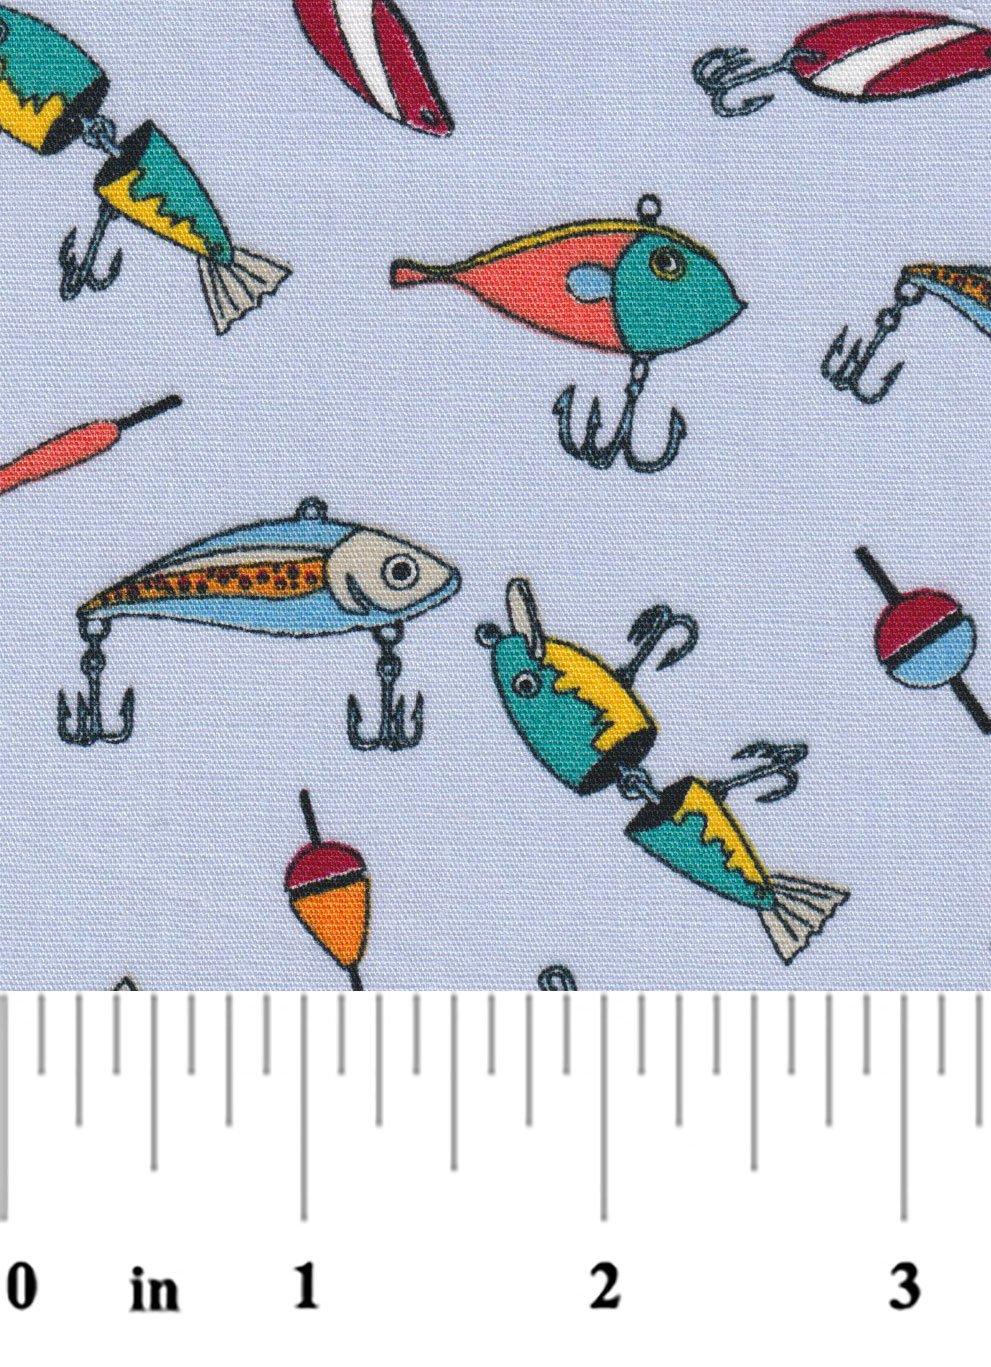 Fishing Lure Fabric 2296